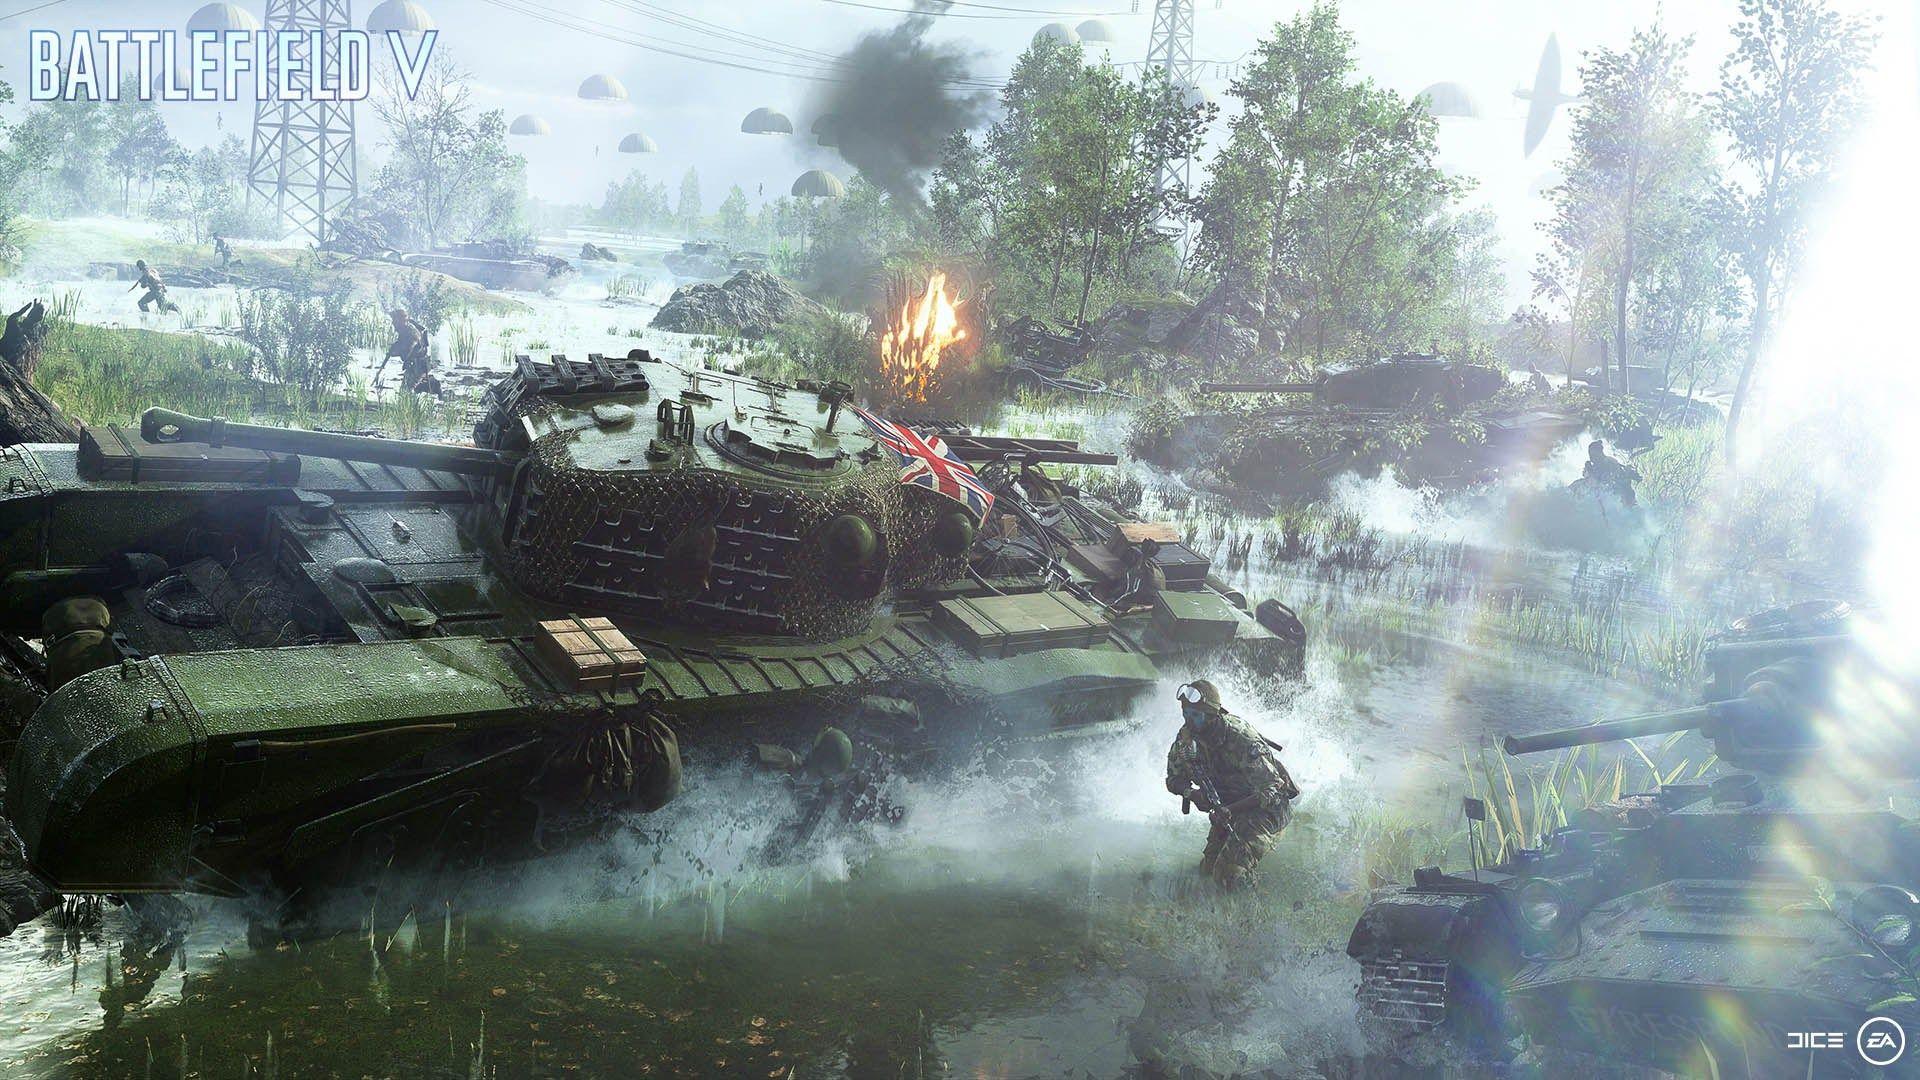 Battlefield 5 Wallpaper With Images Battlefield Battlefield 5